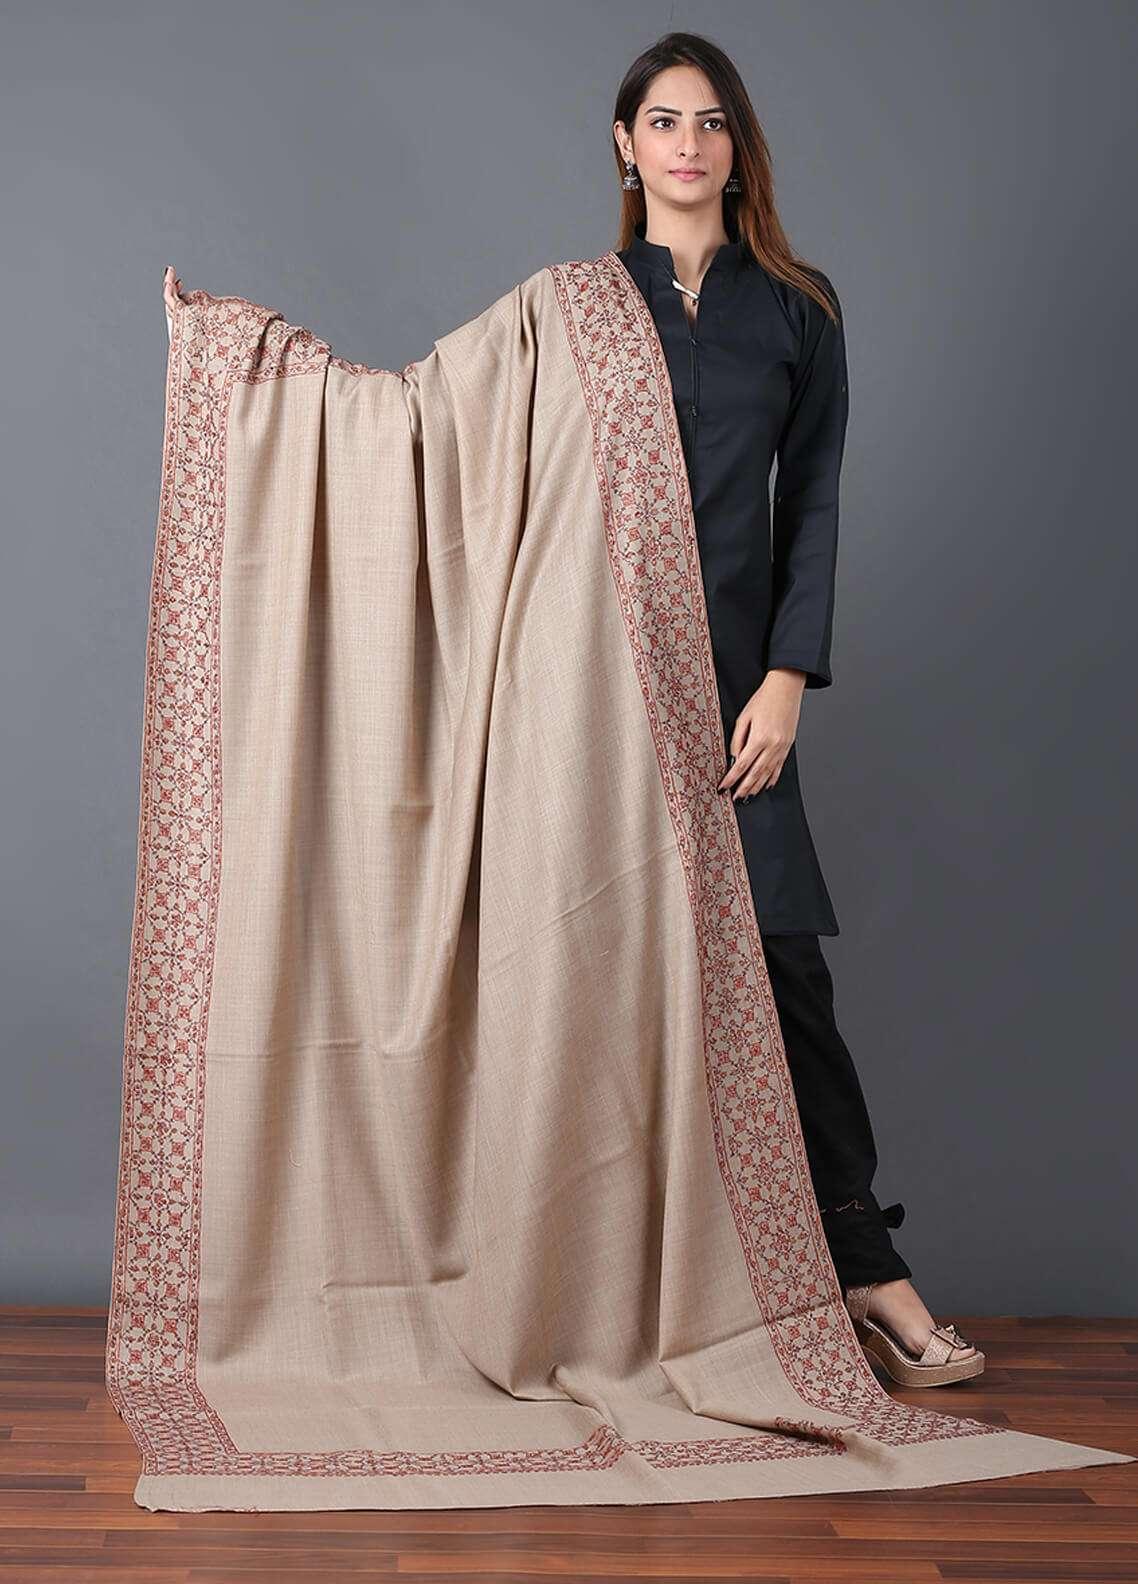 Sanaulla Exclusive Range Pashmina Embroidered Shawl 671 - Kashmiri Shawls